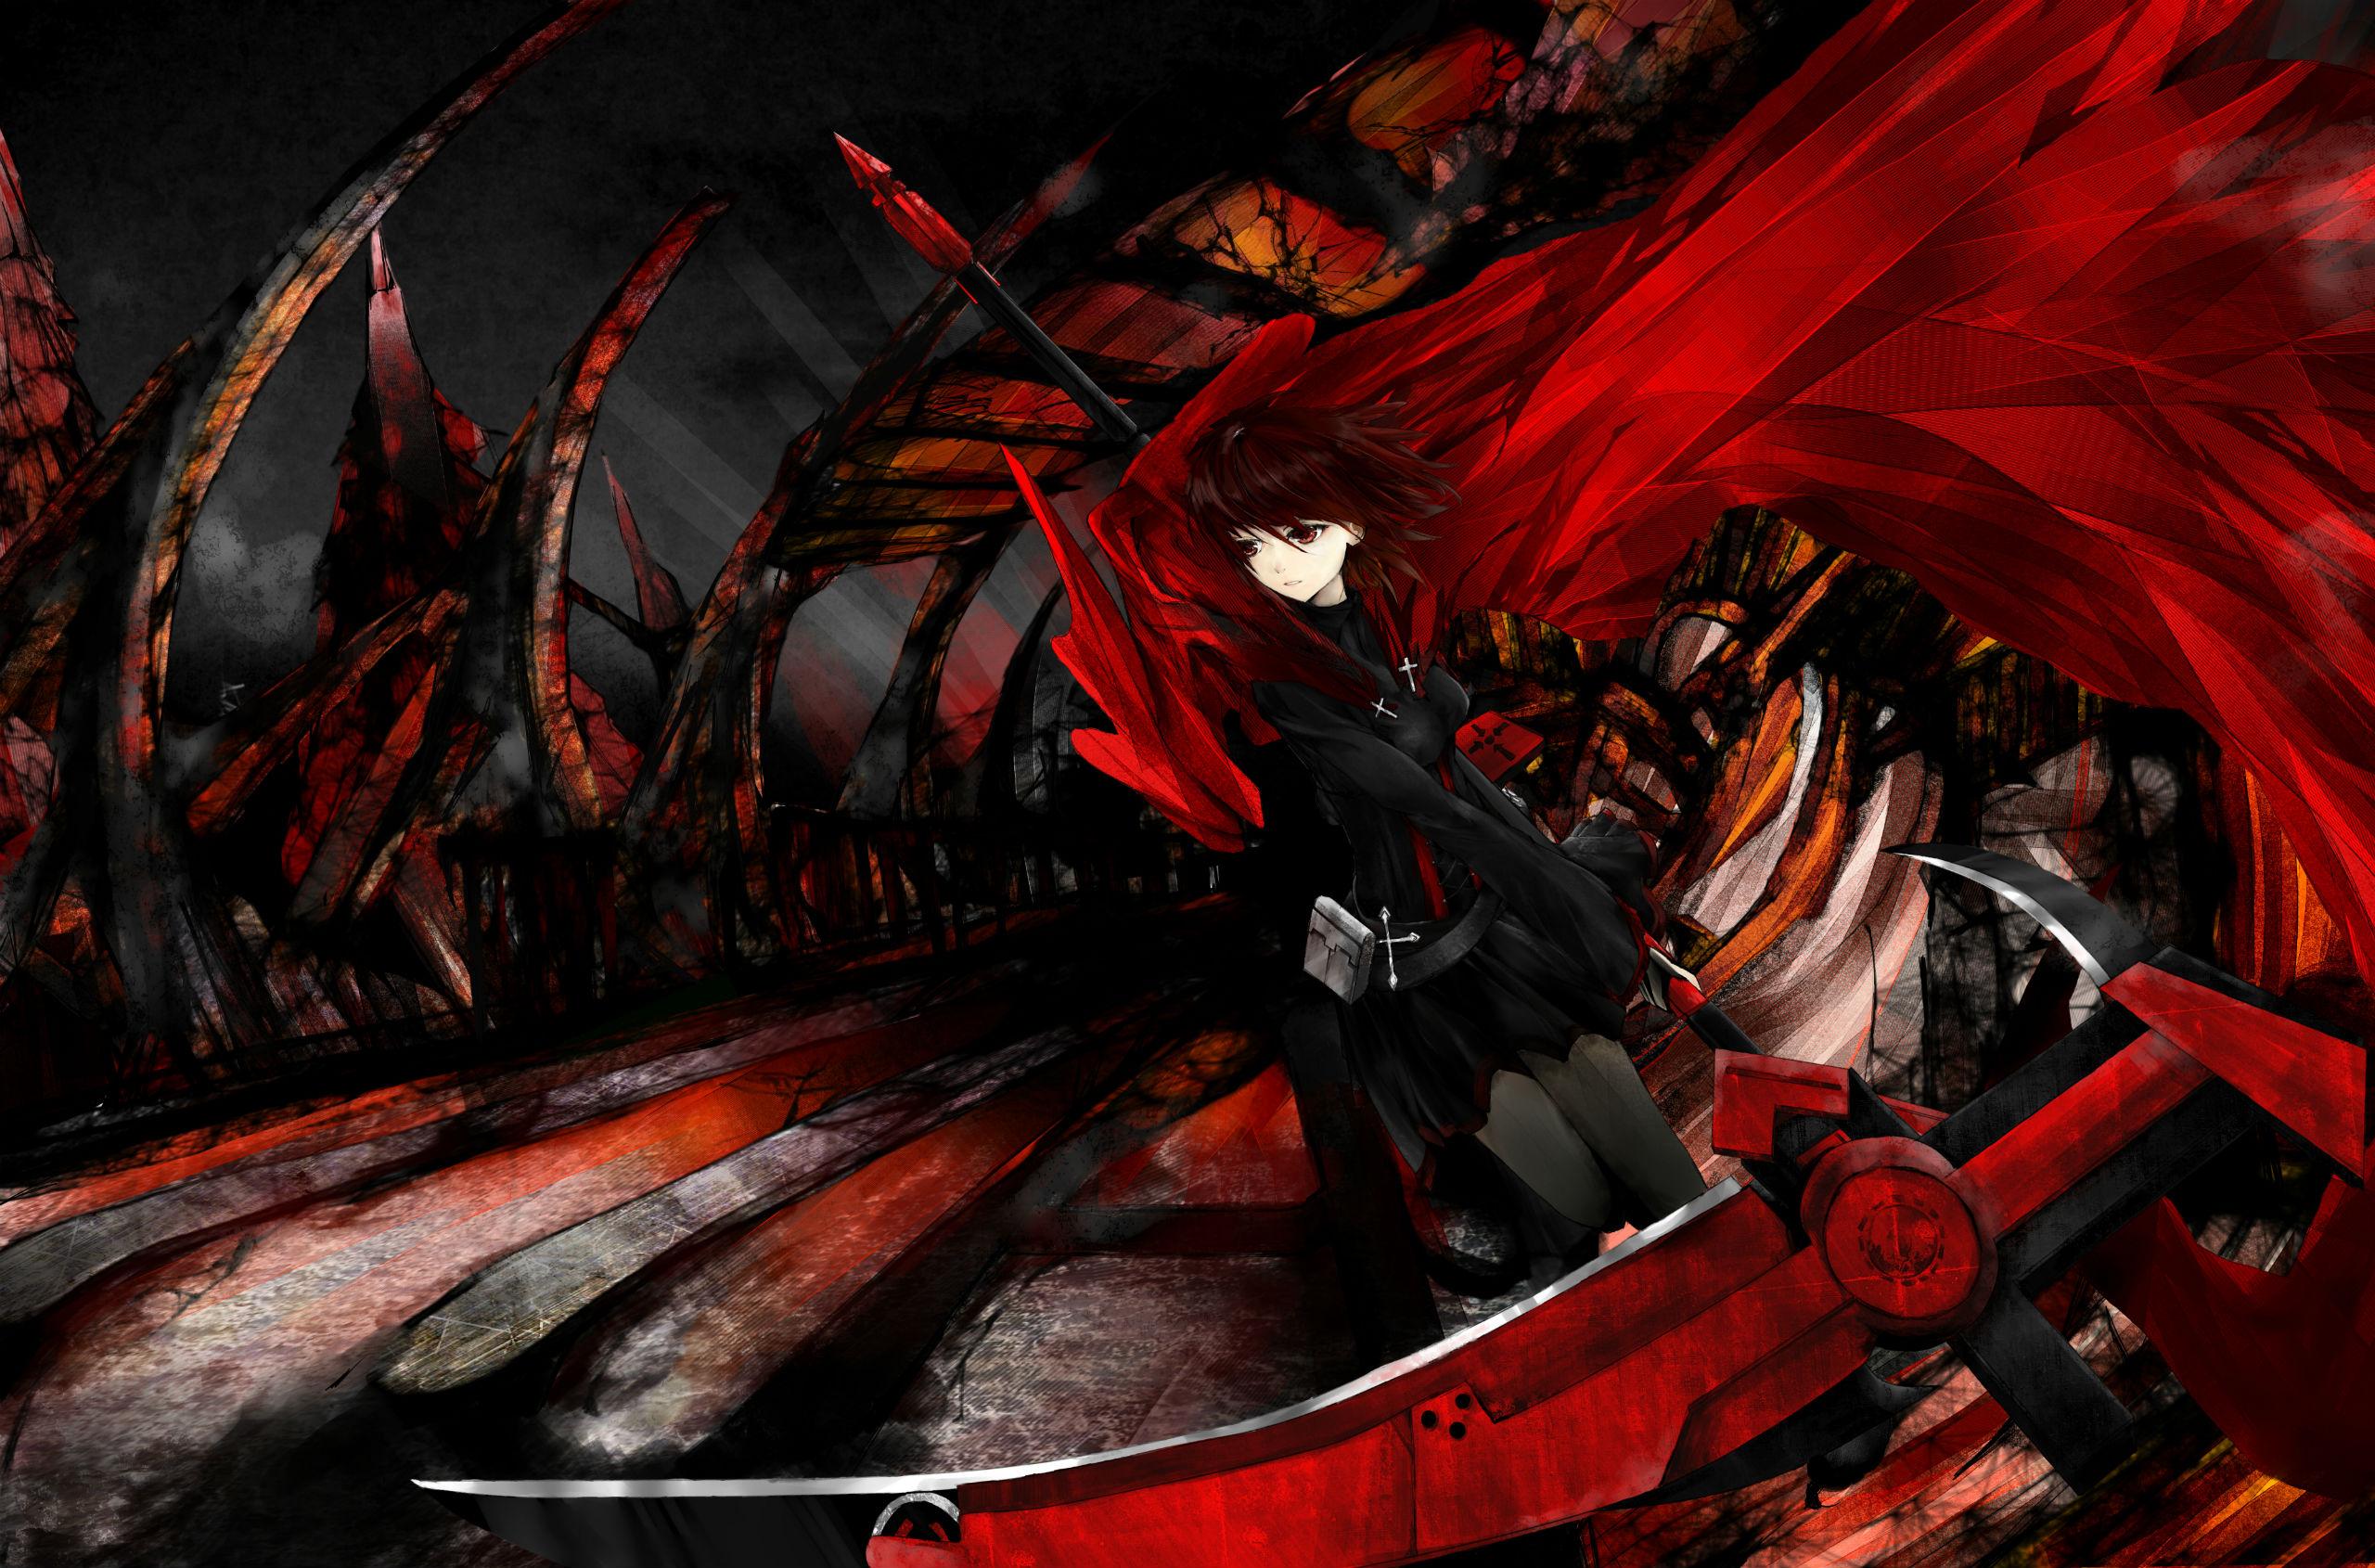 rwby anime scythe wallpaper - photo #9